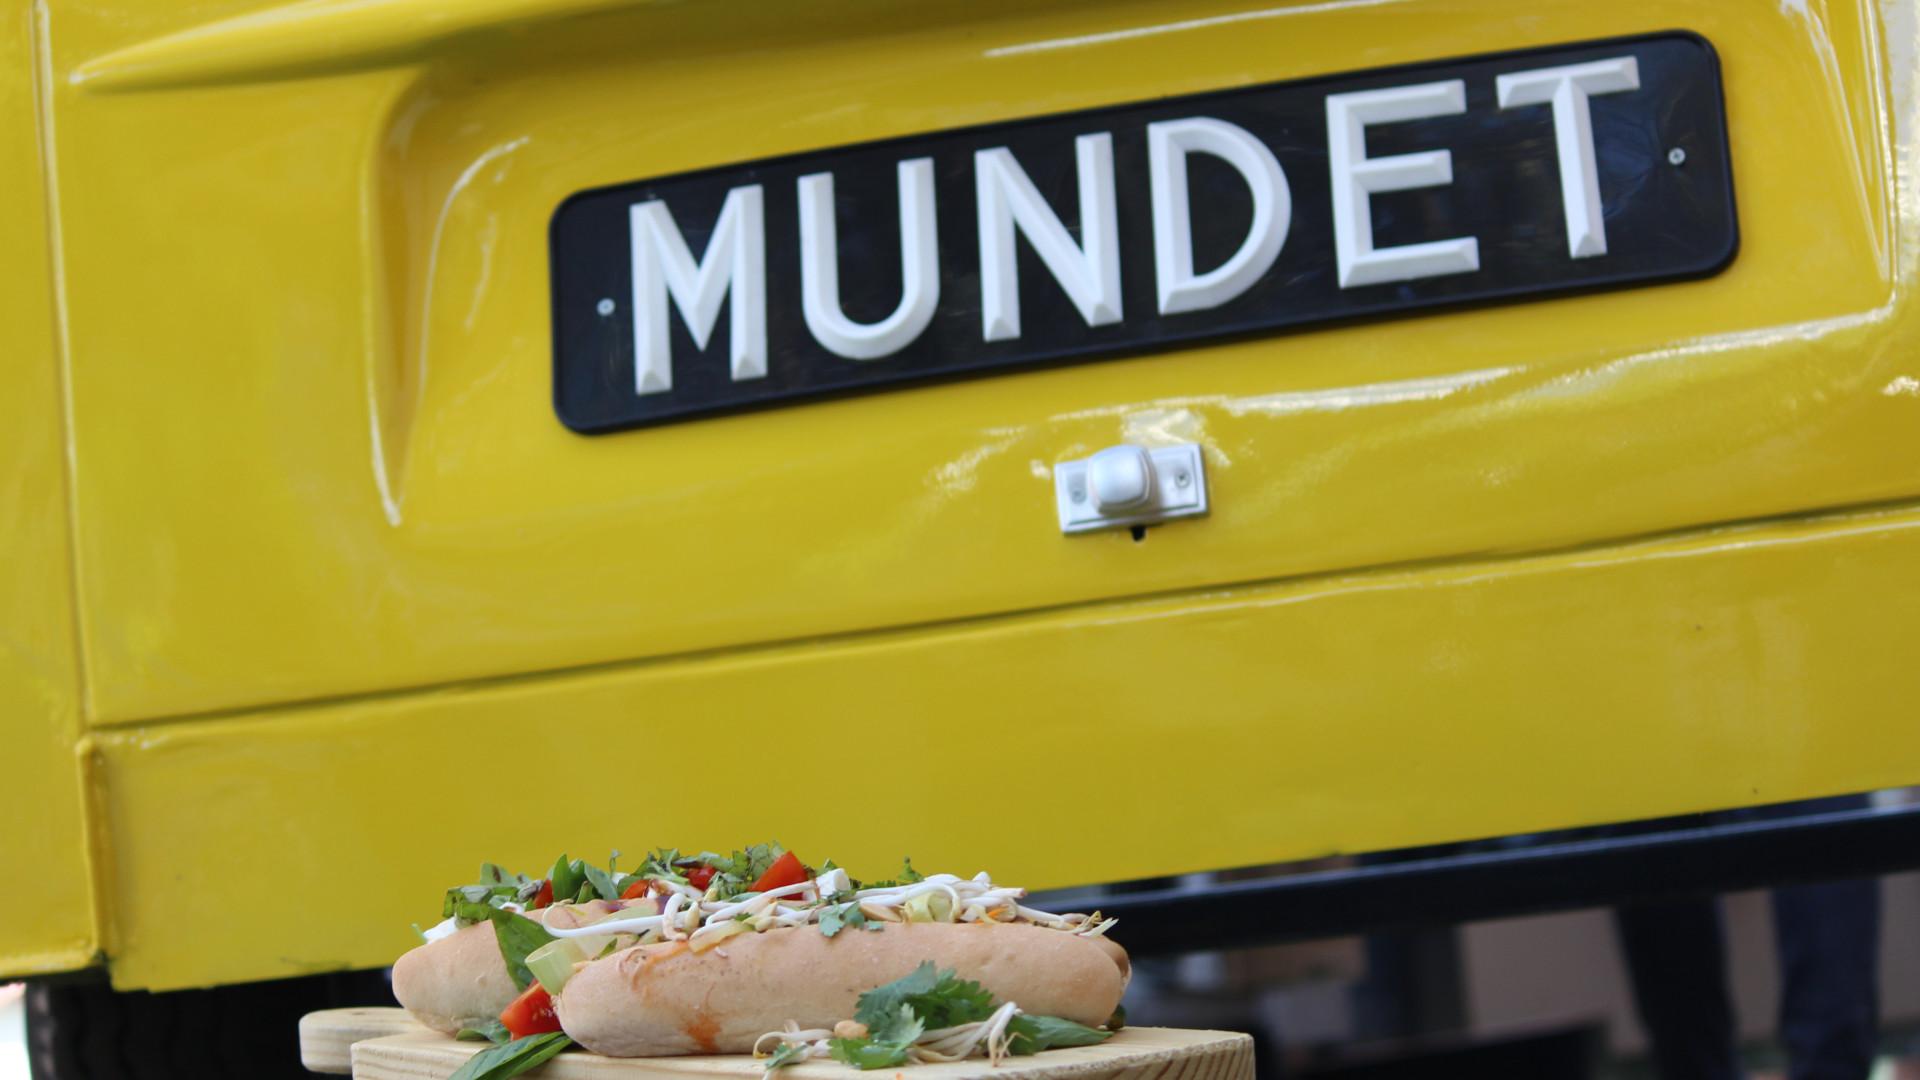 A street food chegou à Mundet Factory (delicie-se)